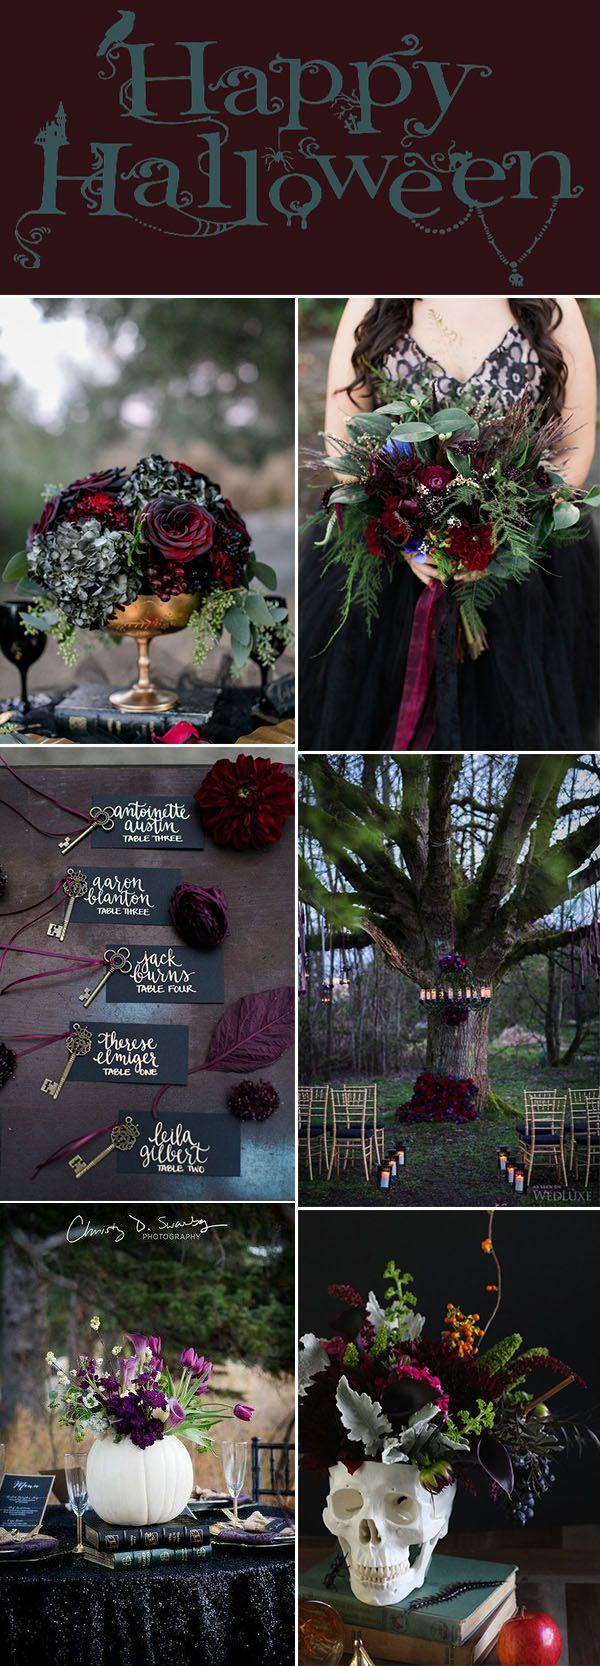 30 Chic Fun Halloween Wedding Ideas By Theme Elegantweddinginvites Com Blog Halloween Themed Wedding Halloween Wedding Decorations Wedding Themes